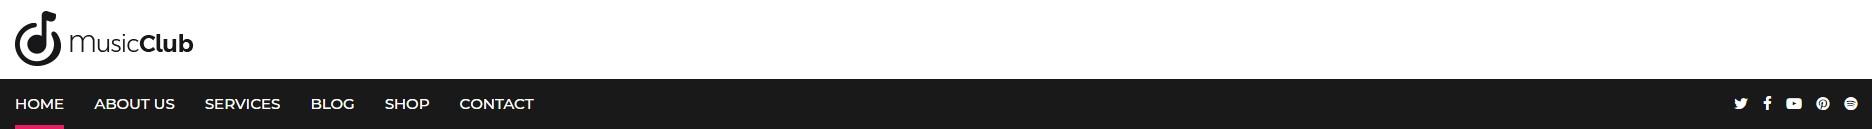 https://documentation.bold-themes.com/music-club/wp-content/uploads/sites/19/2017/11/music-club-header-light-dark.jpg